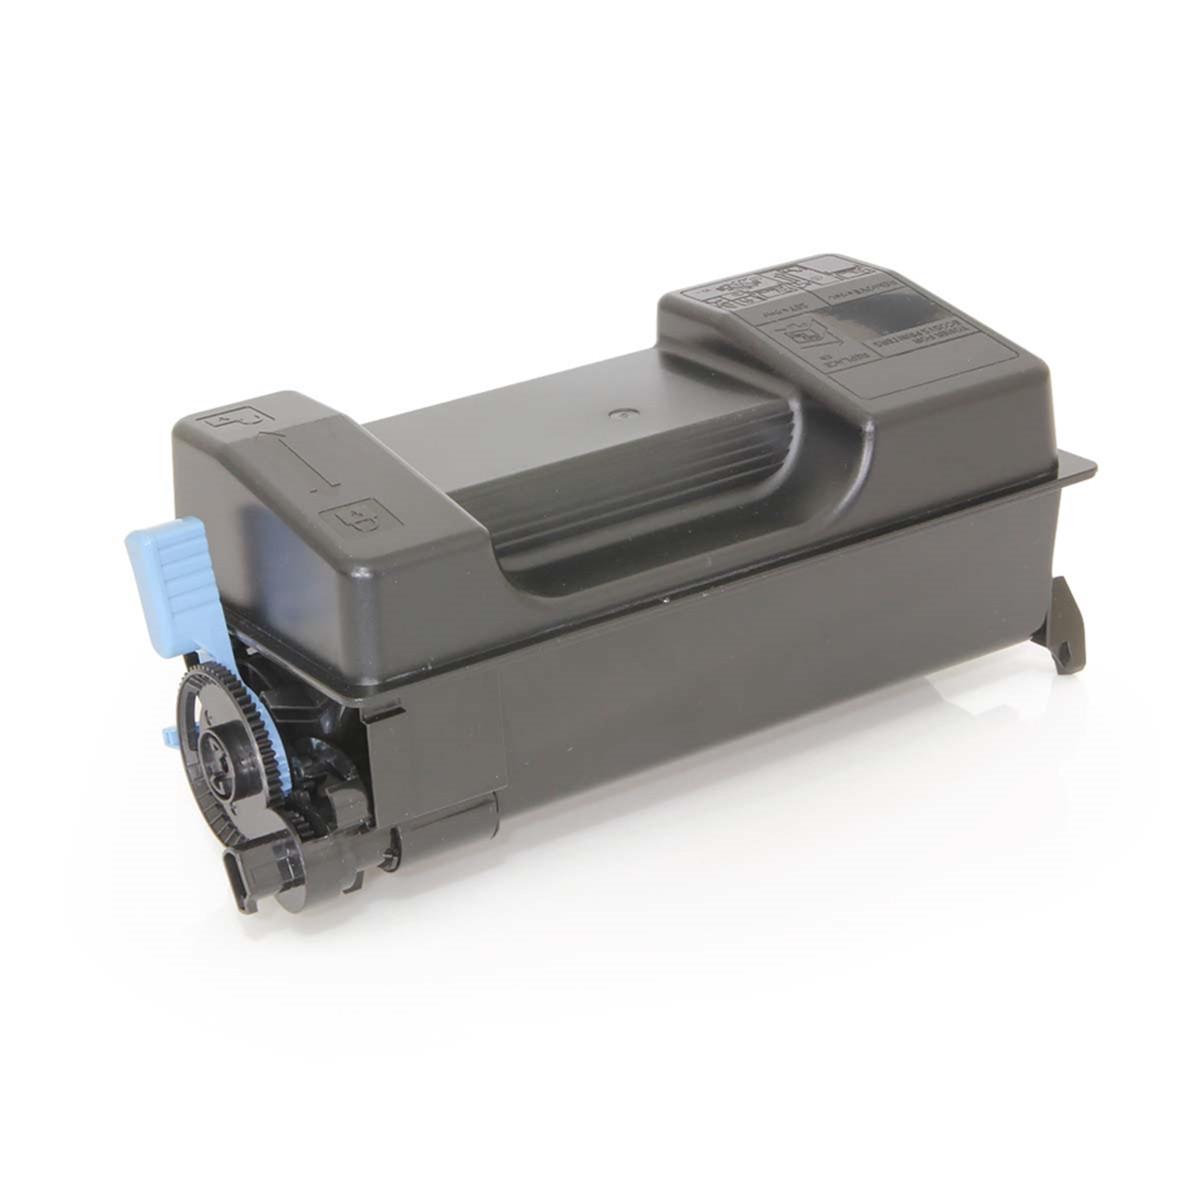 Toner Compatível com Kyocera TK-3132 | FS-4300DN | Importado 25k